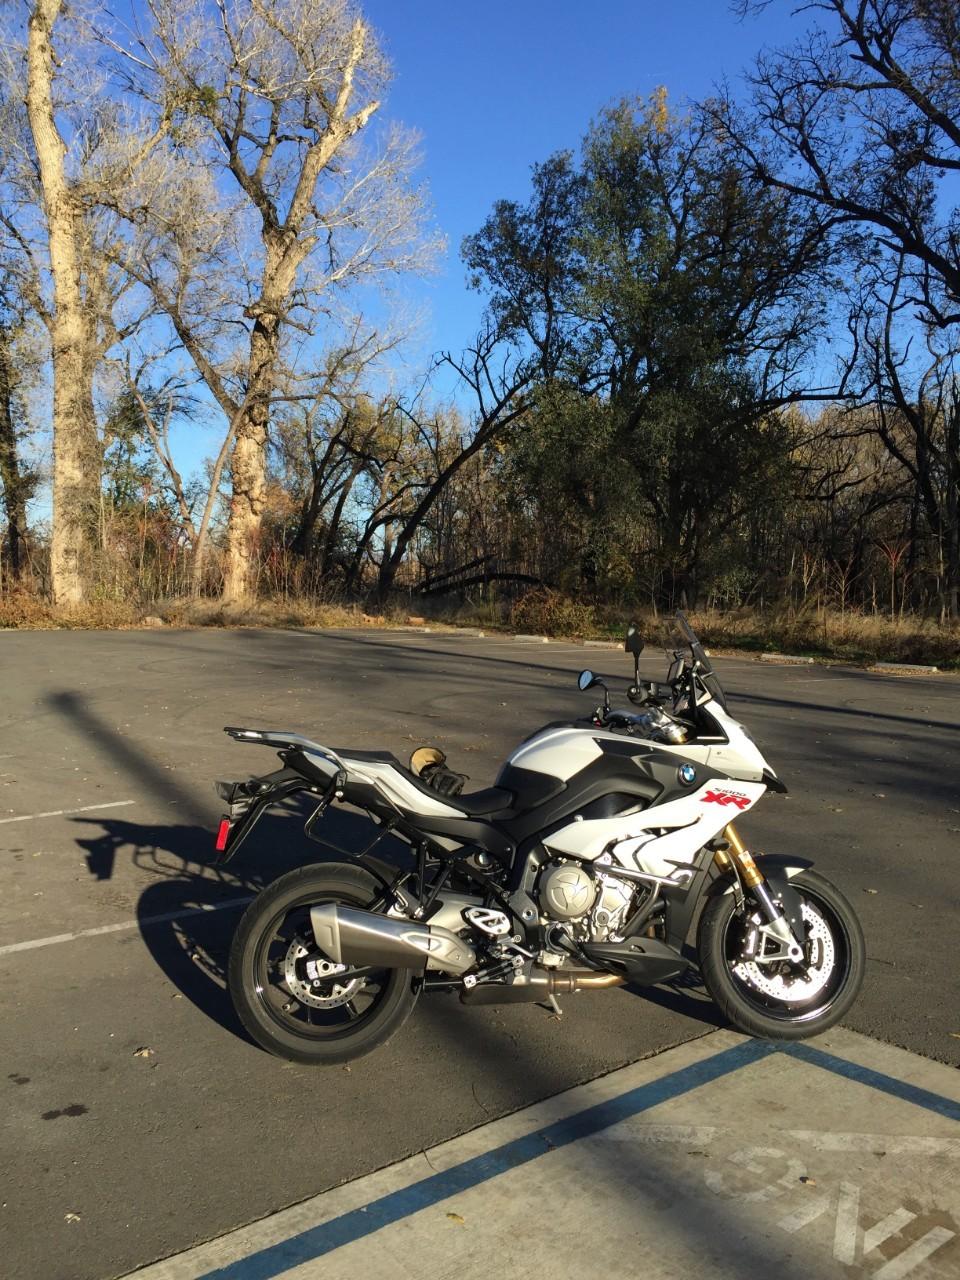 2016 BMW S 1000 XR, Redding CA - - Cycletrader com